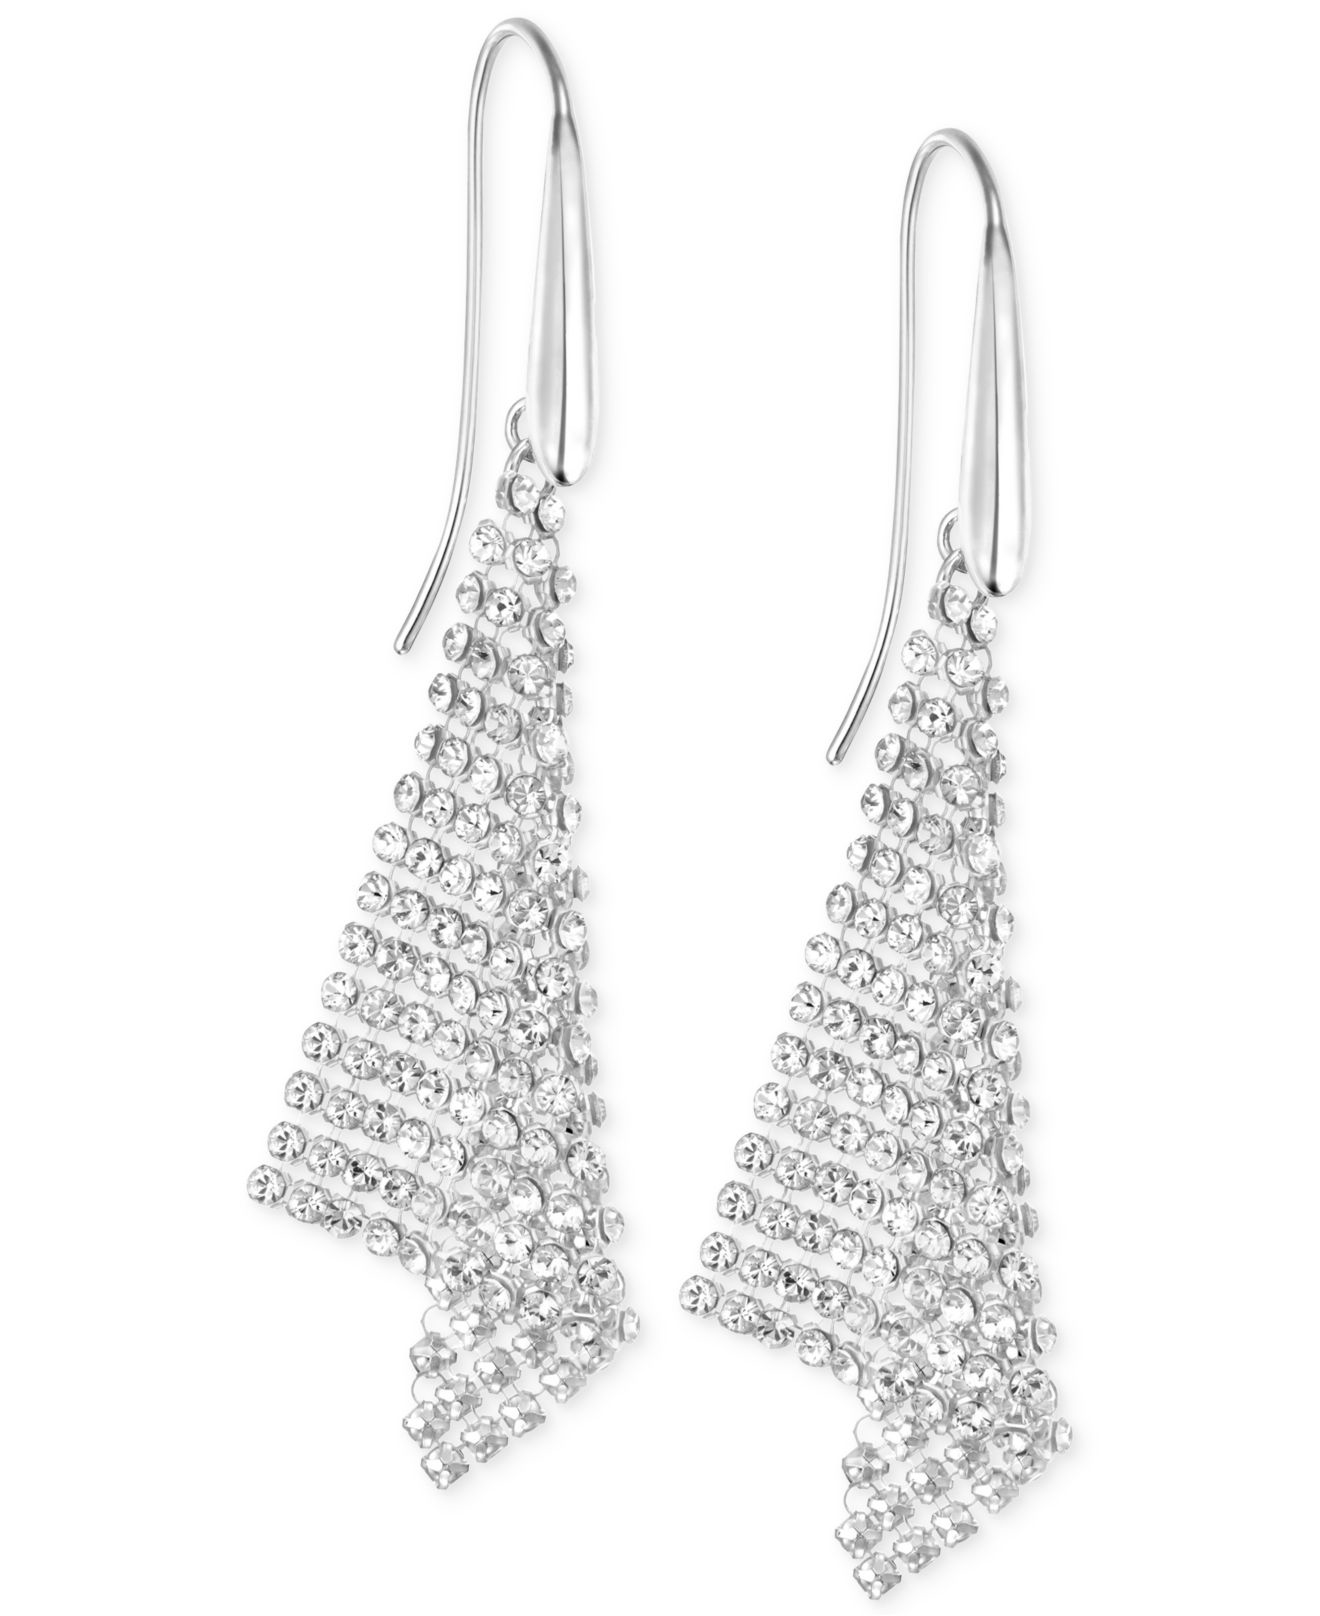 Lyst - Swarovski Silver-tone Crystal Mesh Drop Earrings in Metallic dd8a6ea32589